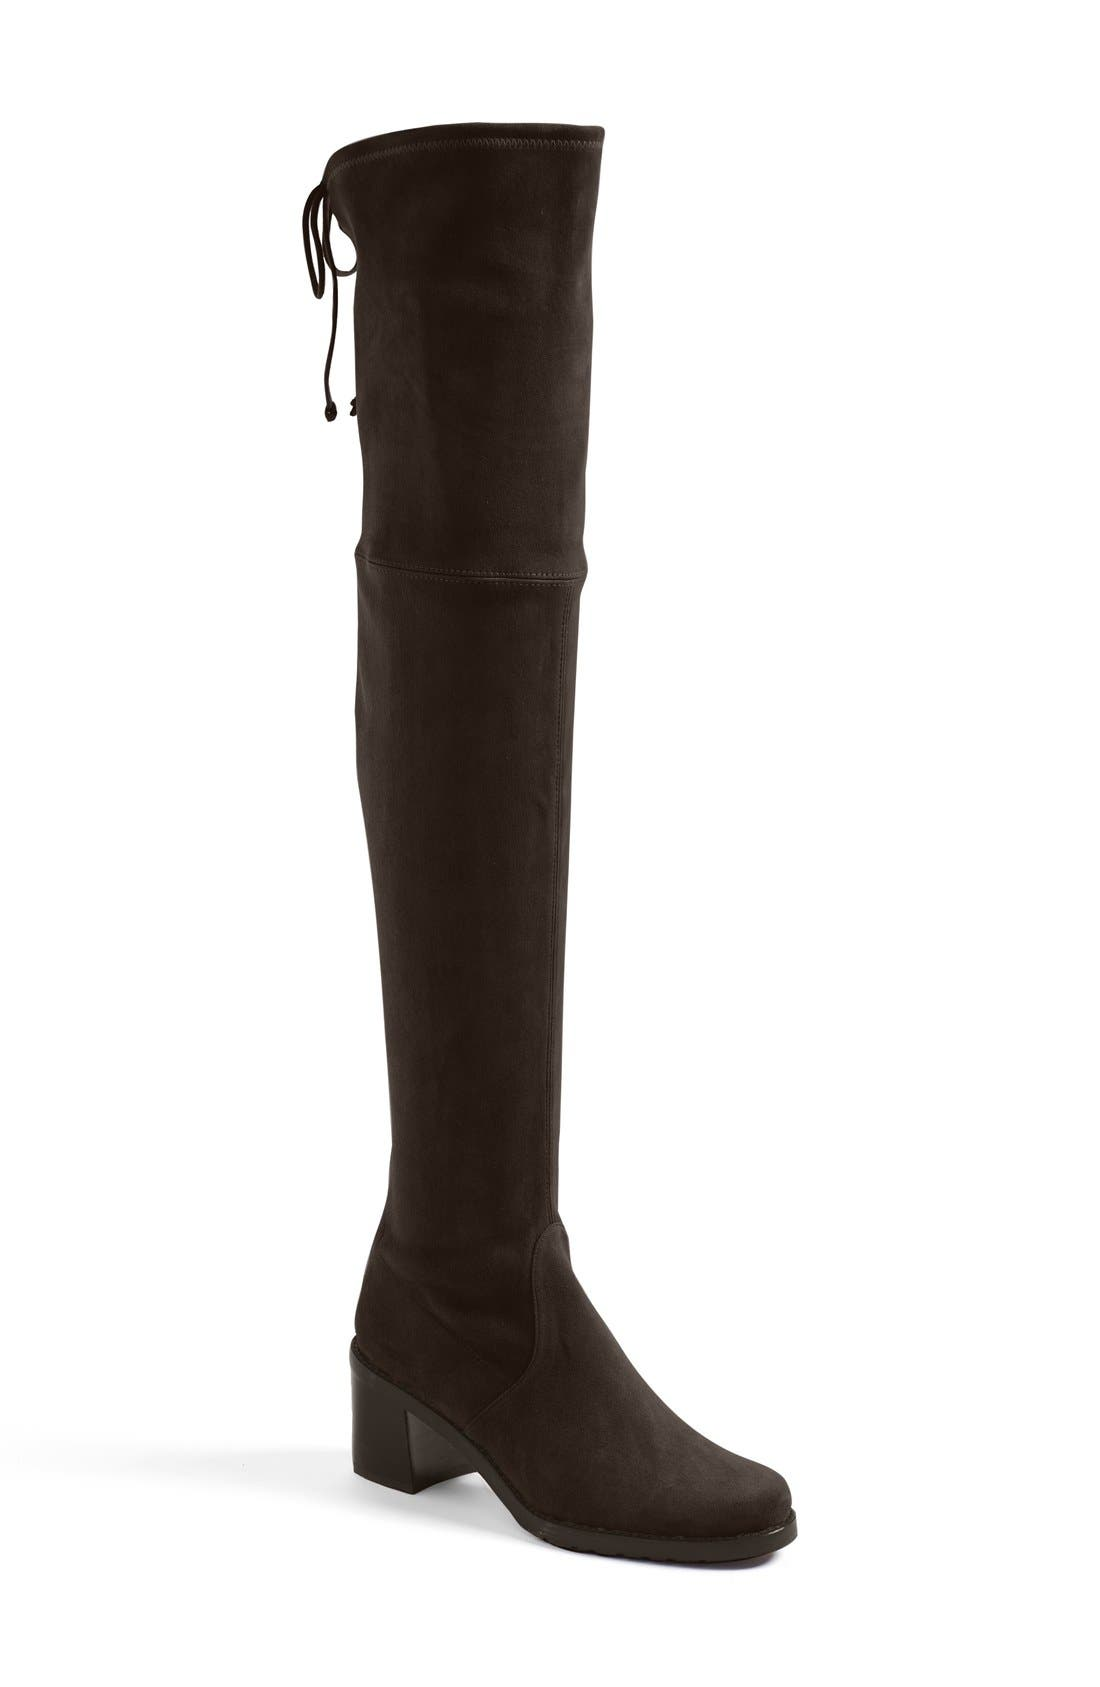 Womens Boots For Sale designer 24756021 Stuart Weitzman Covering Slip On Shoe Londra